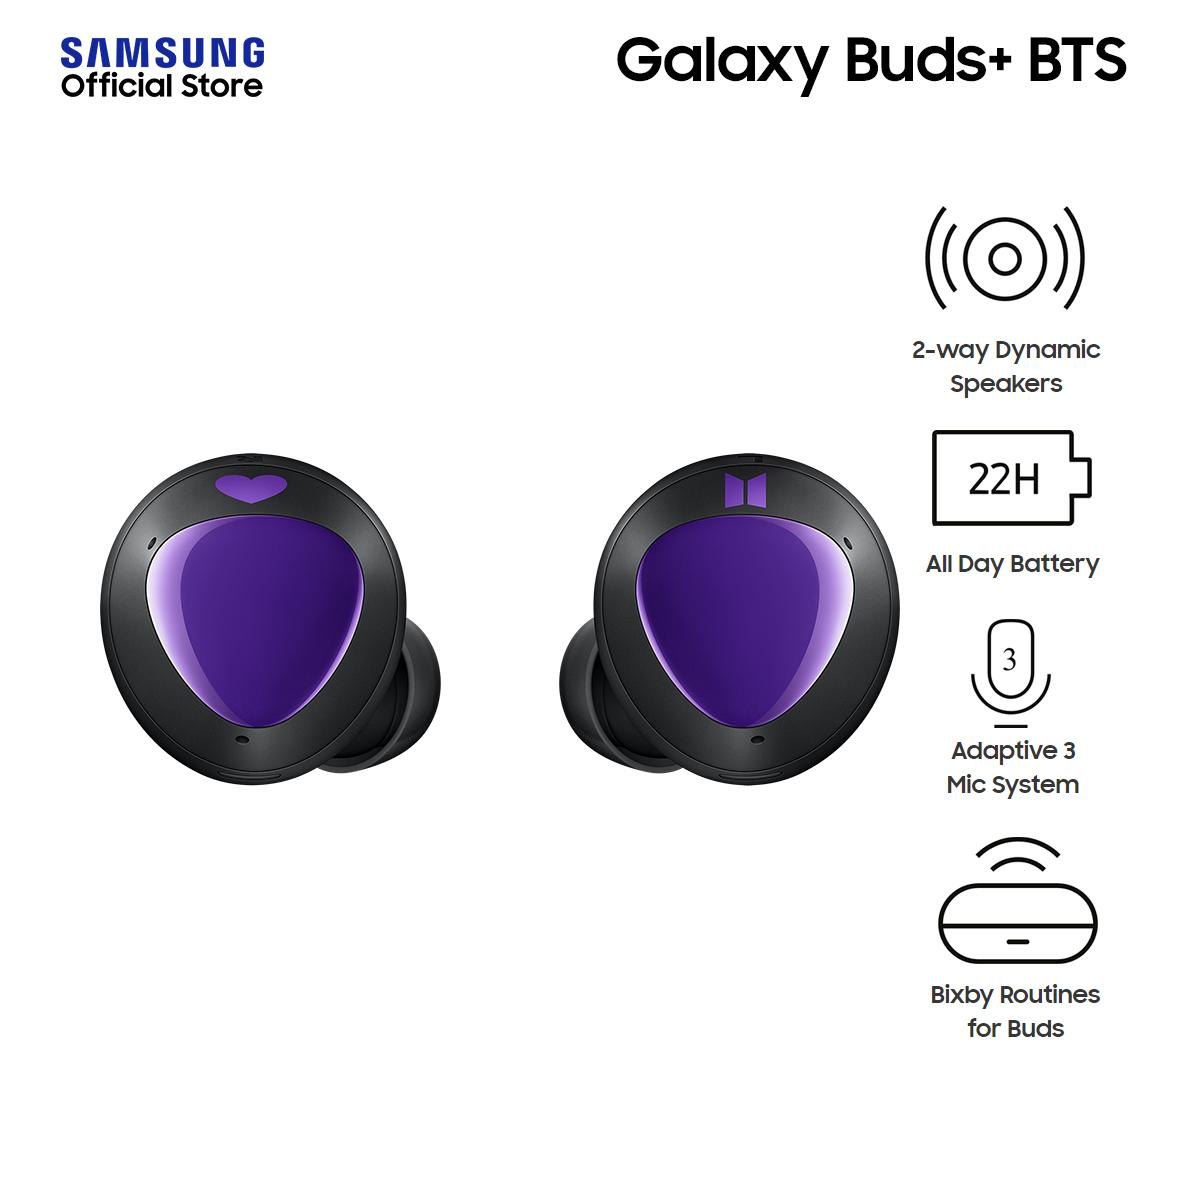 Samsung Galaxy Buds Bts Wireless Earbuds Lazada Ph